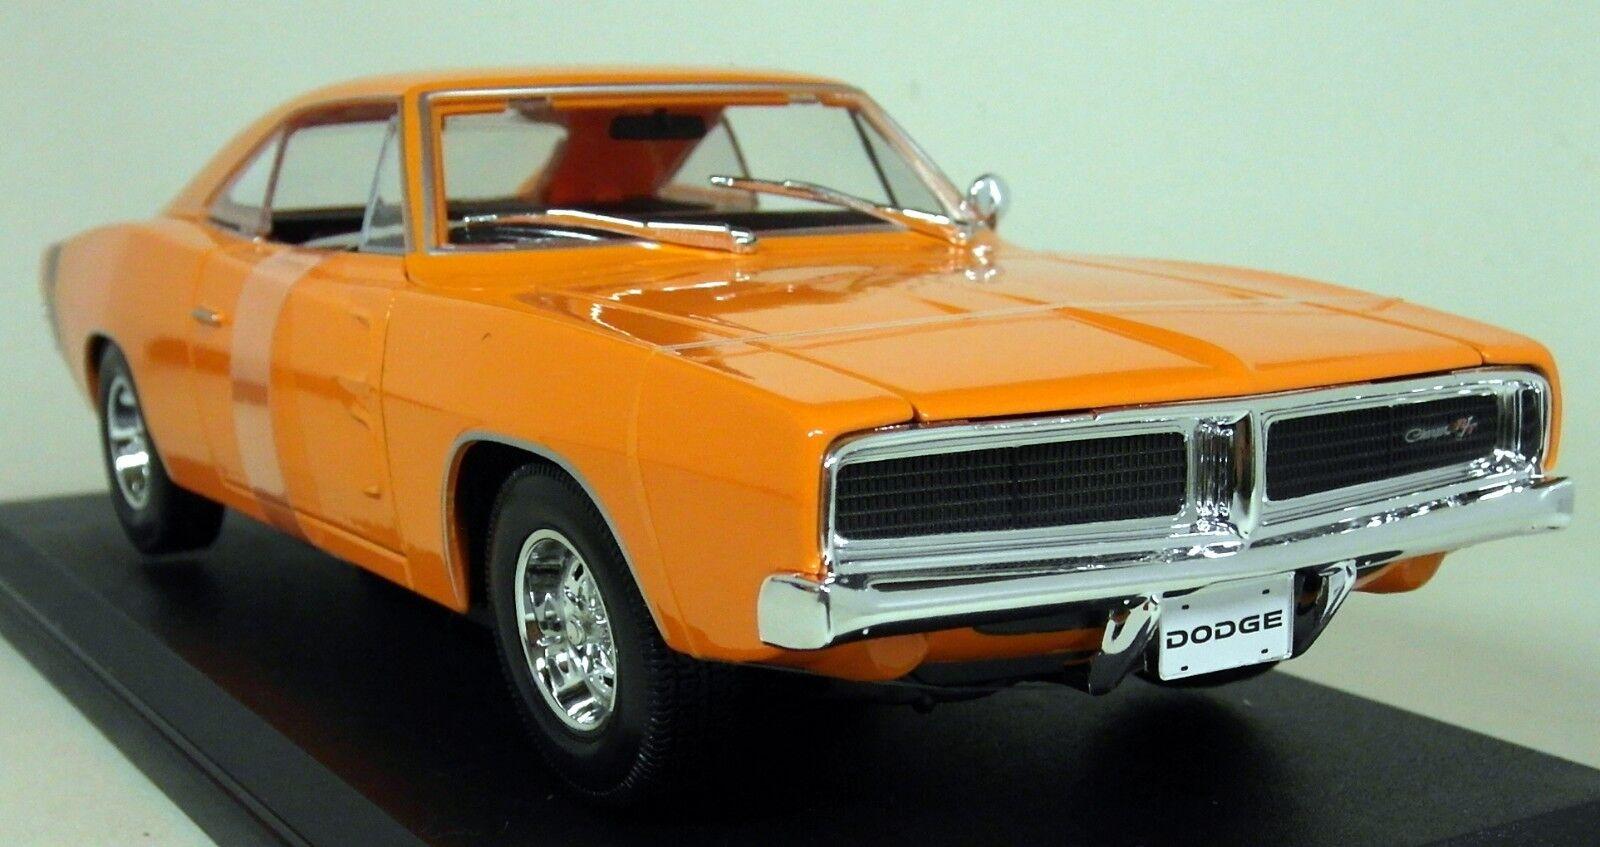 Maisto 1 18 Scale - 1969 Dodge Charger R T orange Diecast Model Car